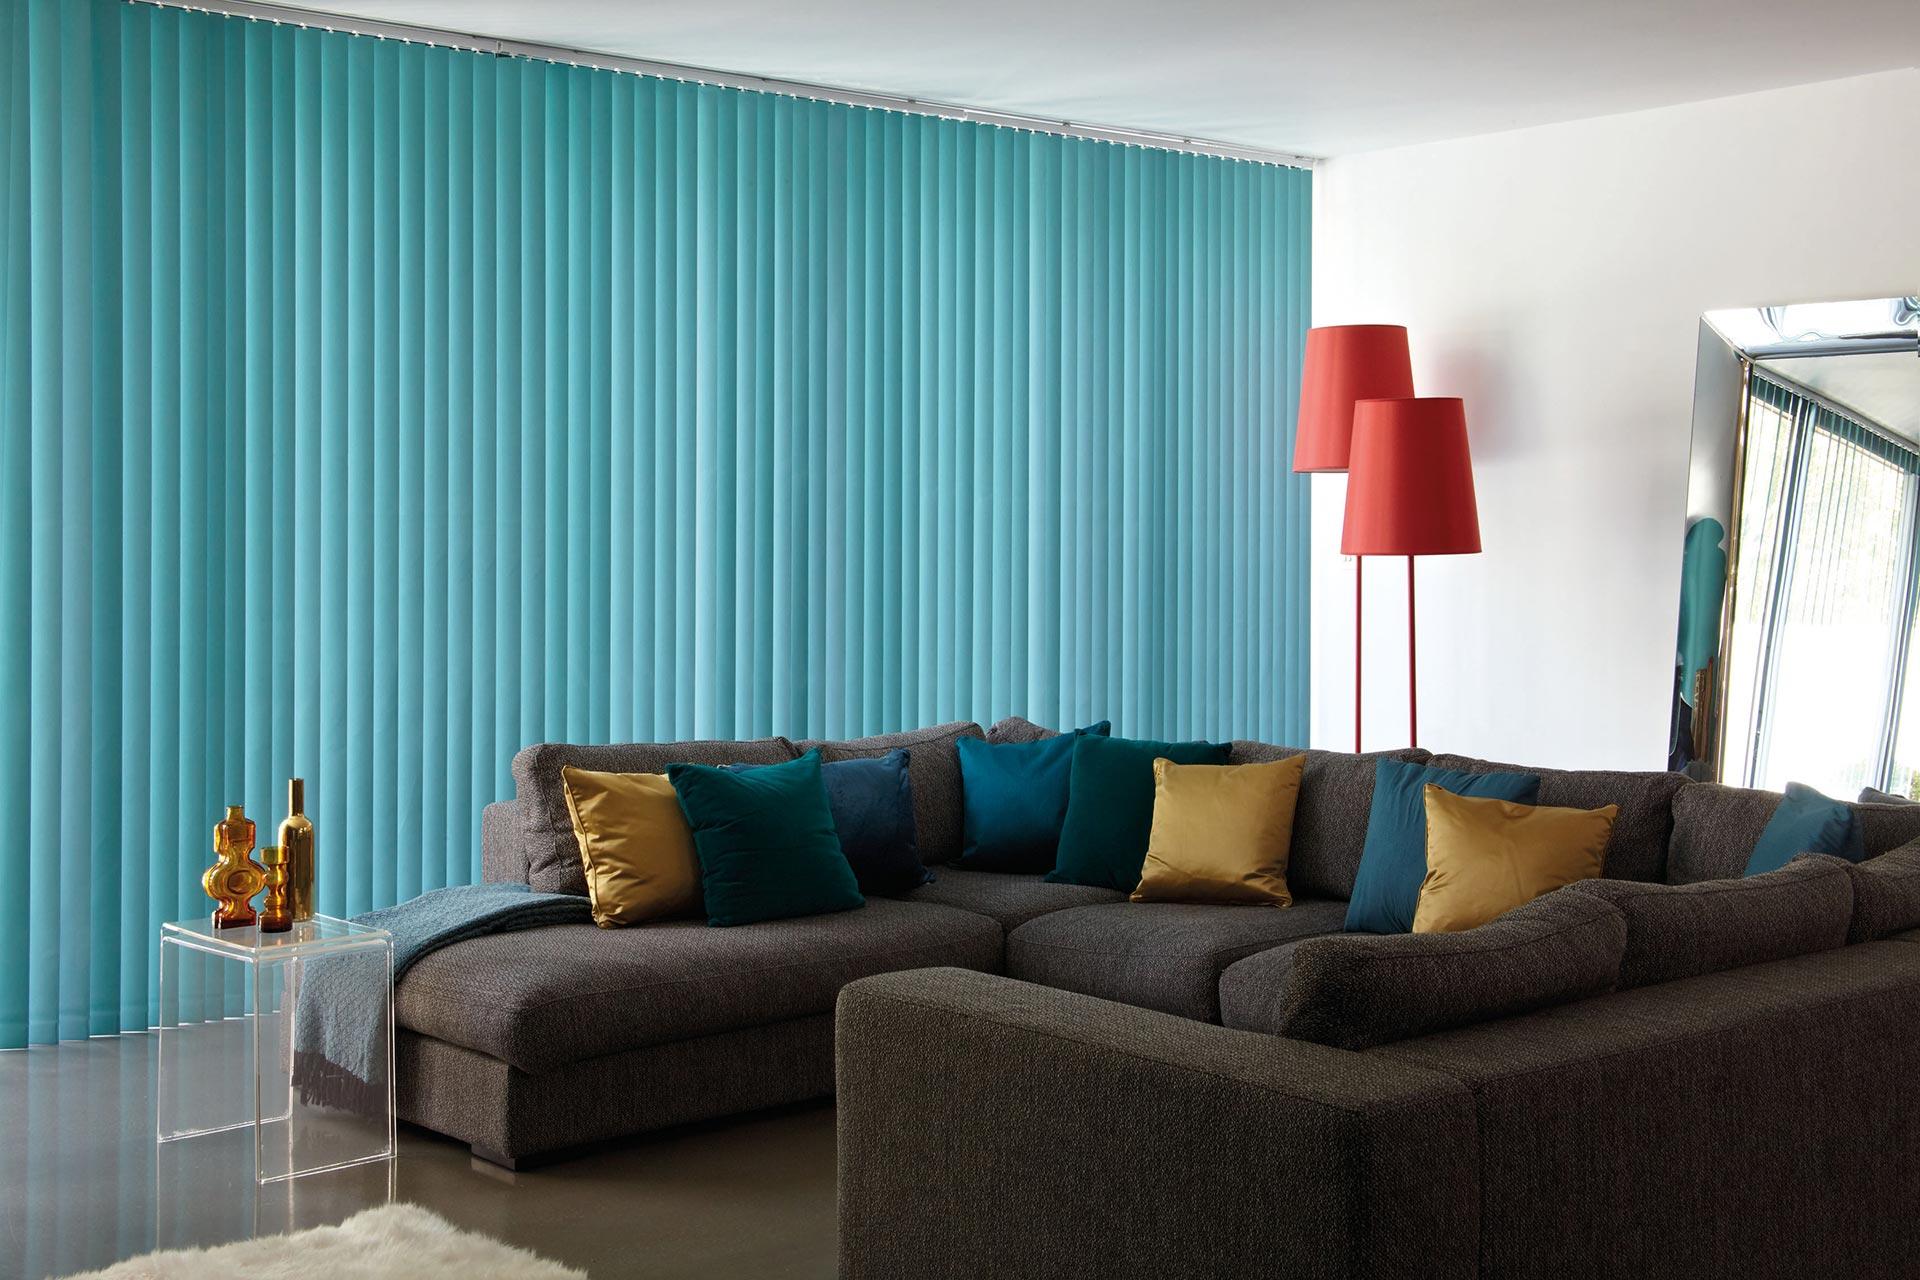 Blue vertical blinds.